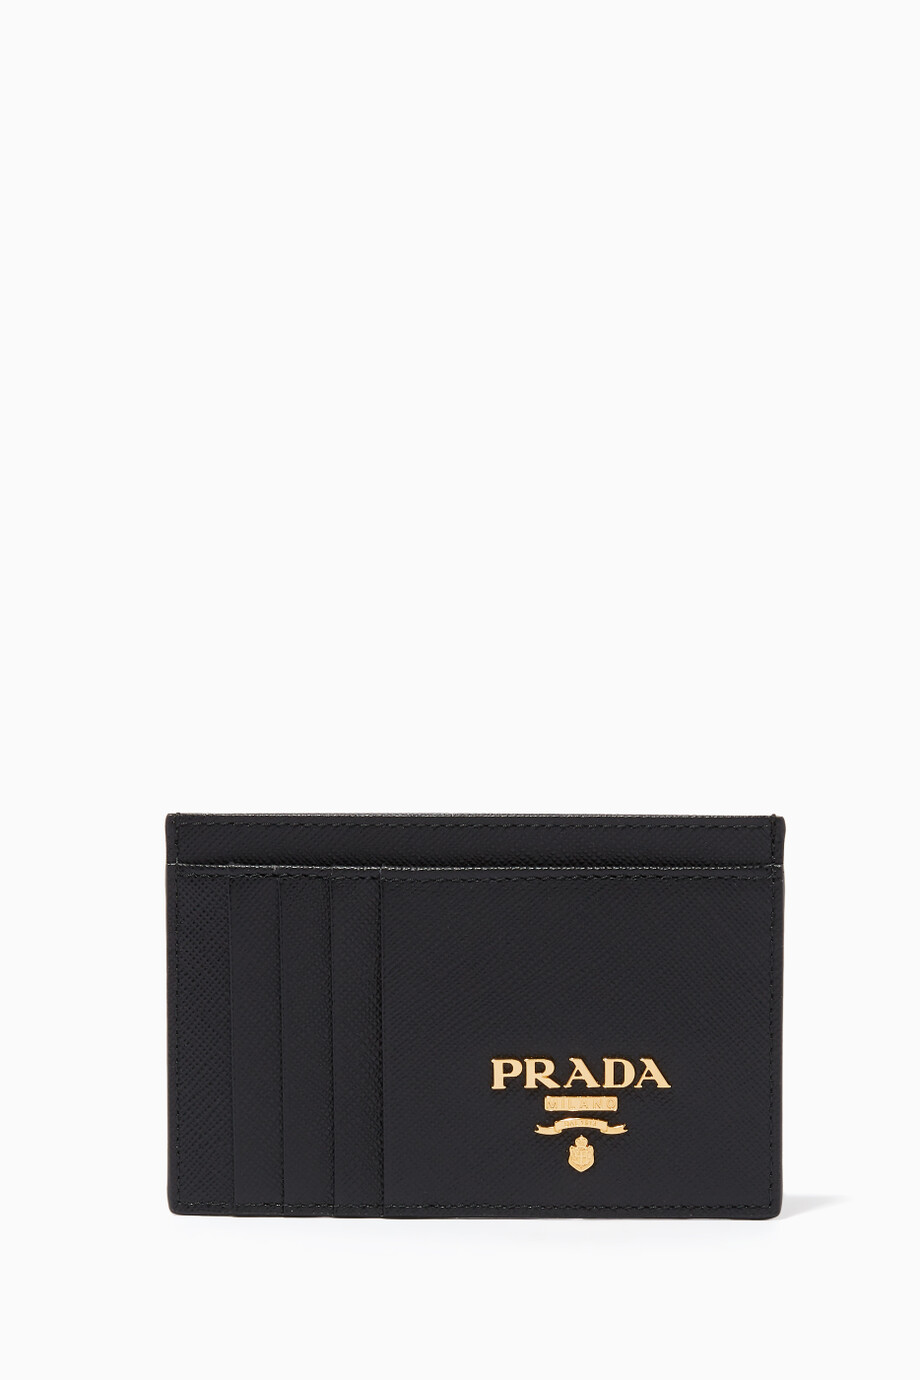 95d888c7947a1 Shop Prada Black Logo Saffiano Leather Long Card Holder for Women